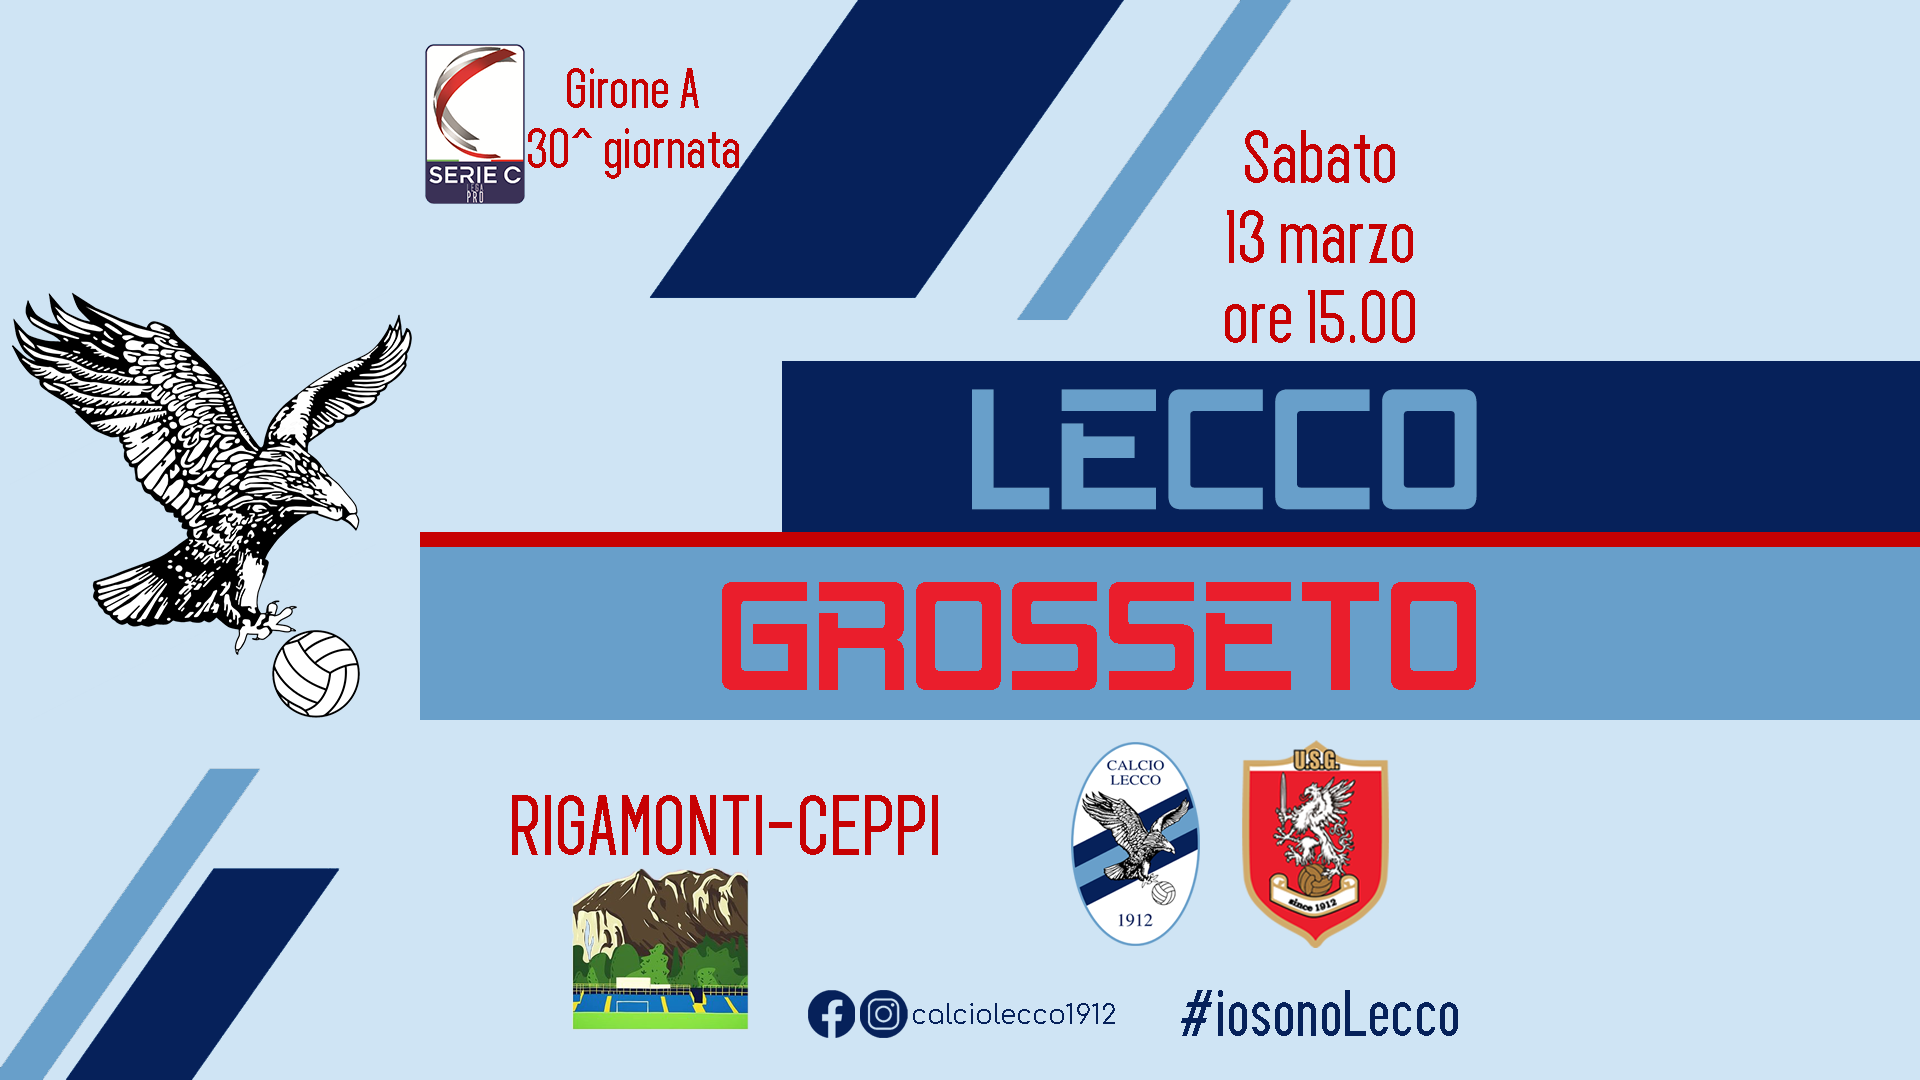 Lecco - Grosseto